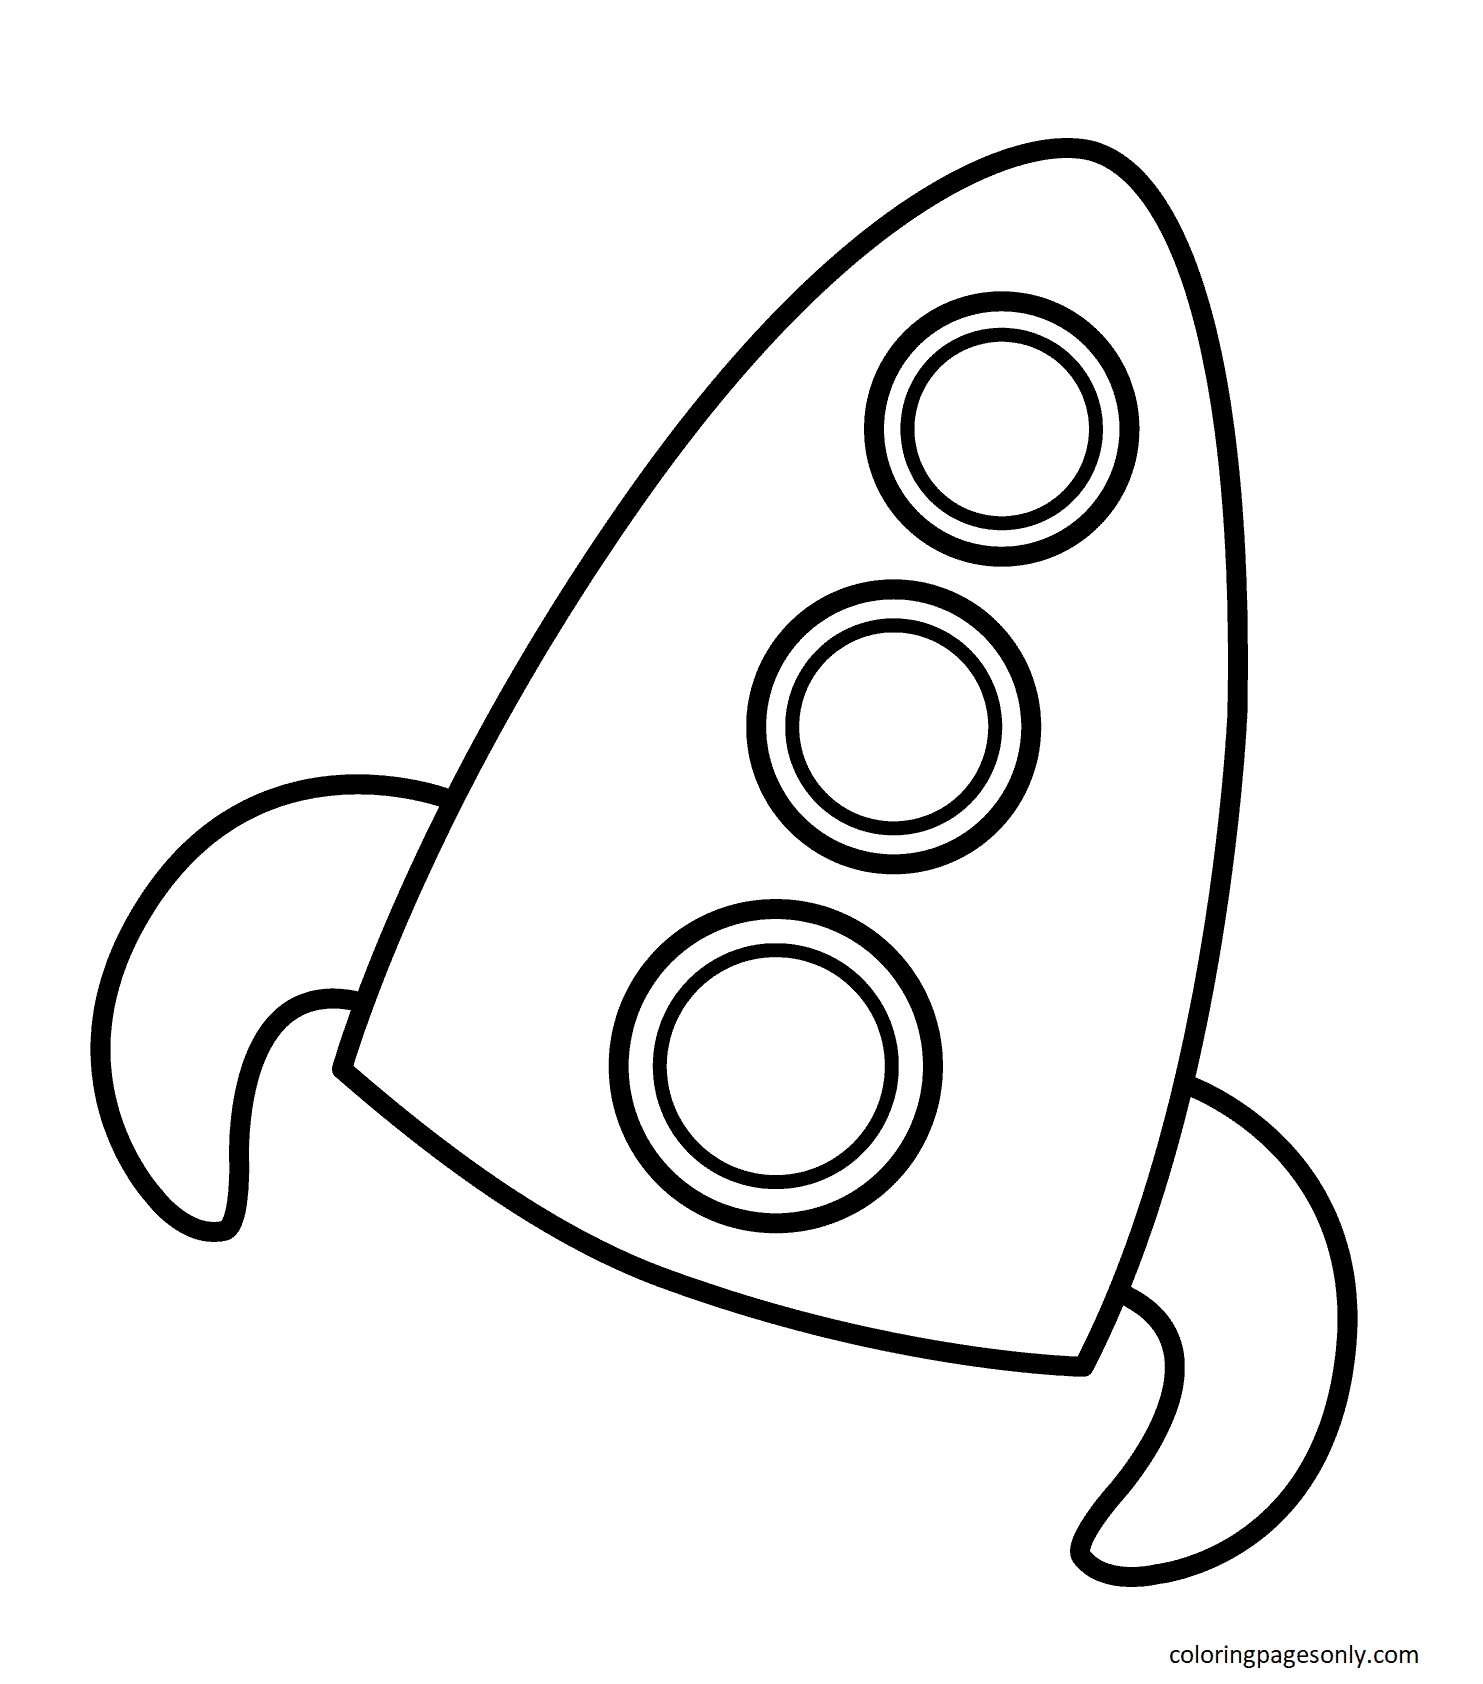 Simple Rocket Coloring Page